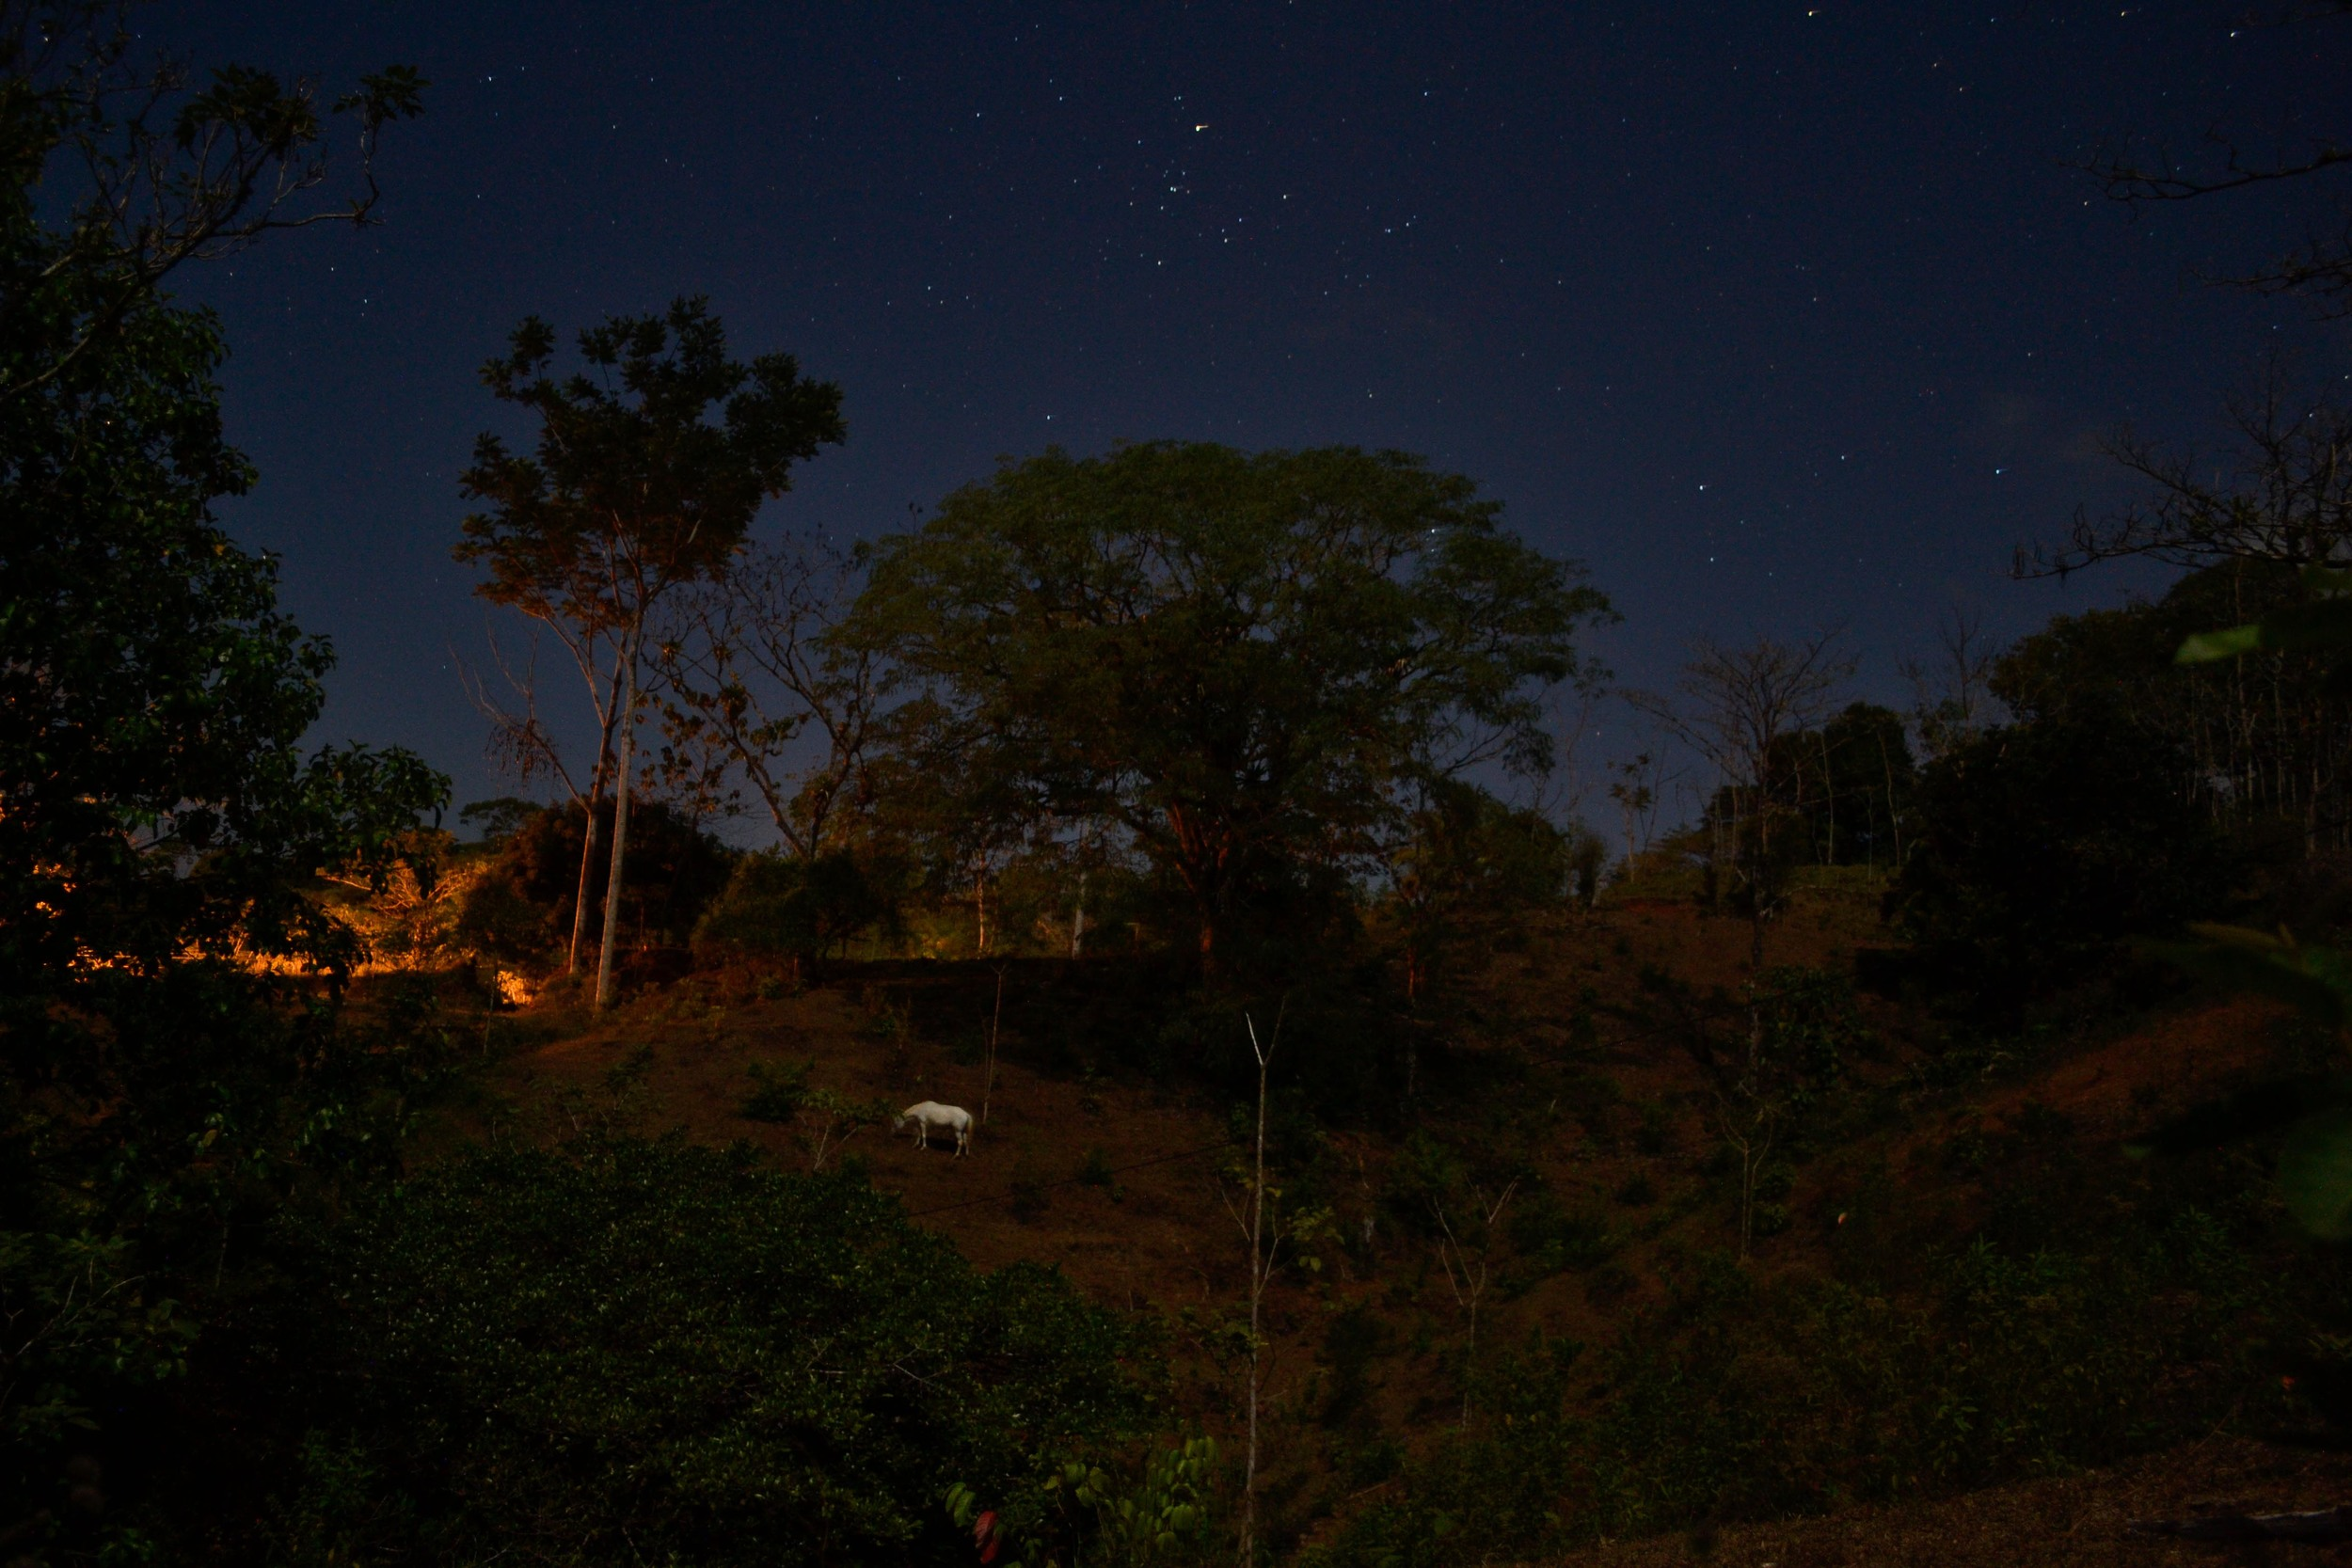 One of La Iguana's horses grazing in the moonlight.